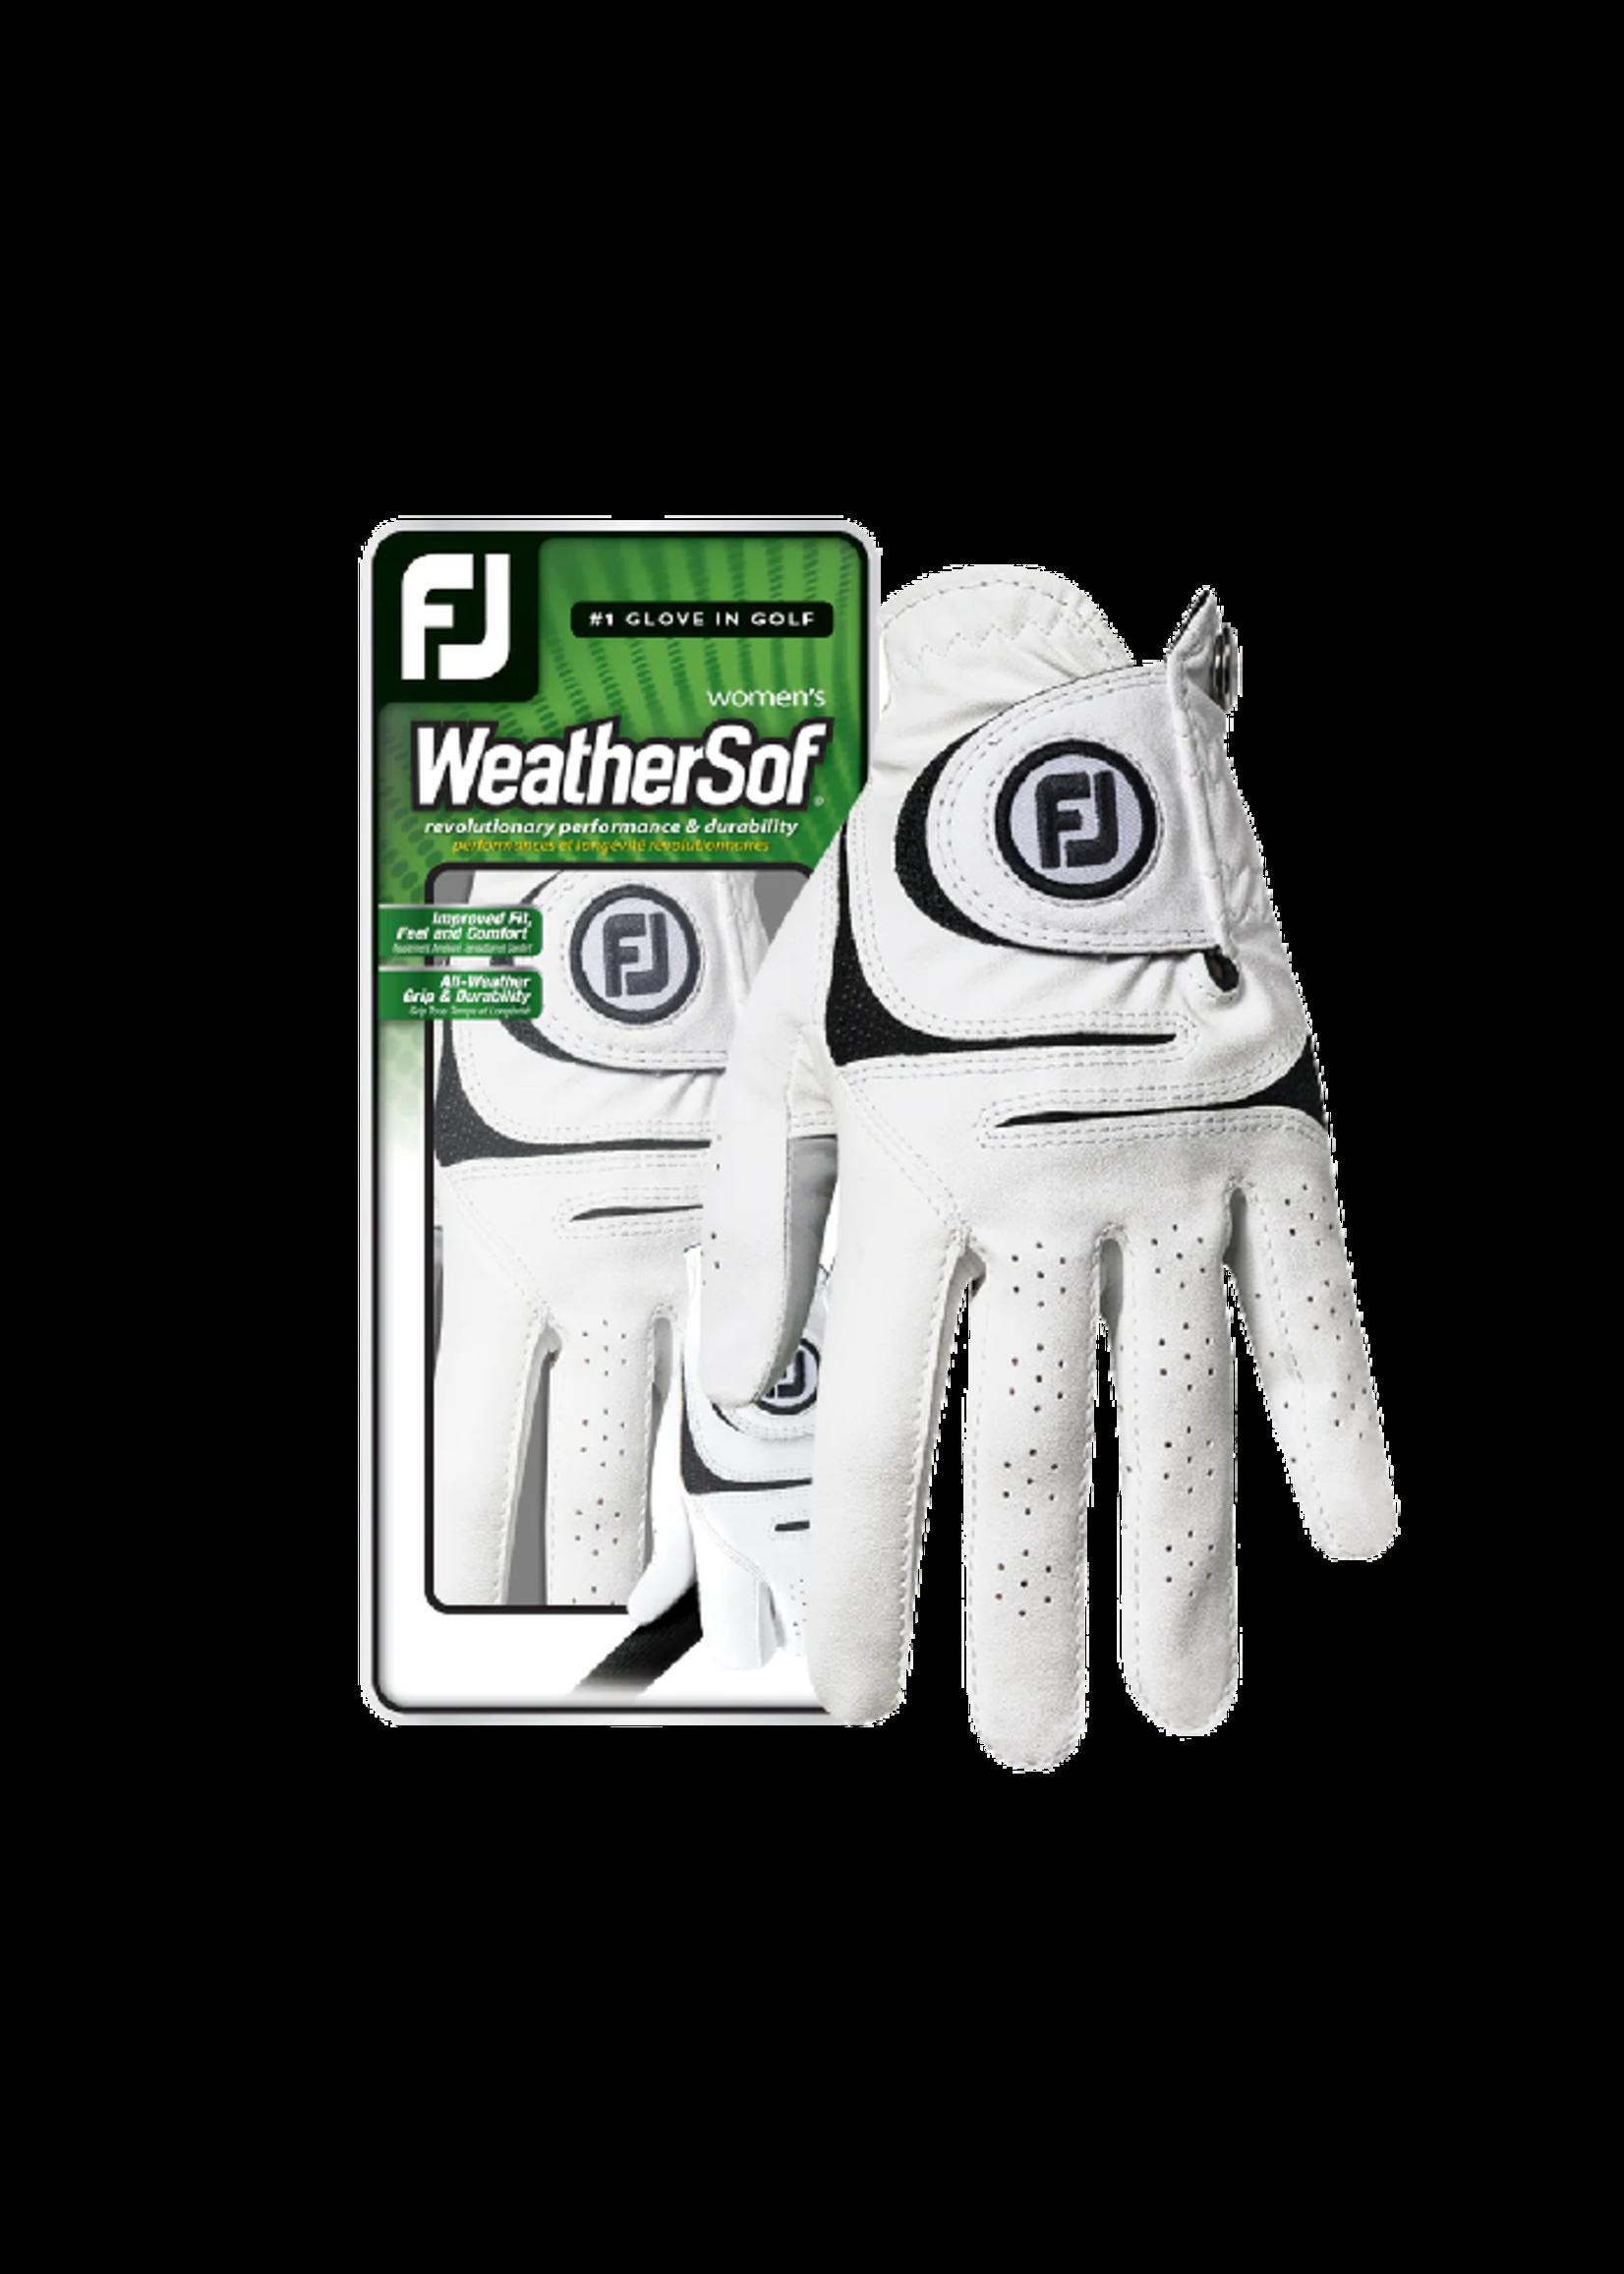 FJ Weathersof Glove Regular Womens